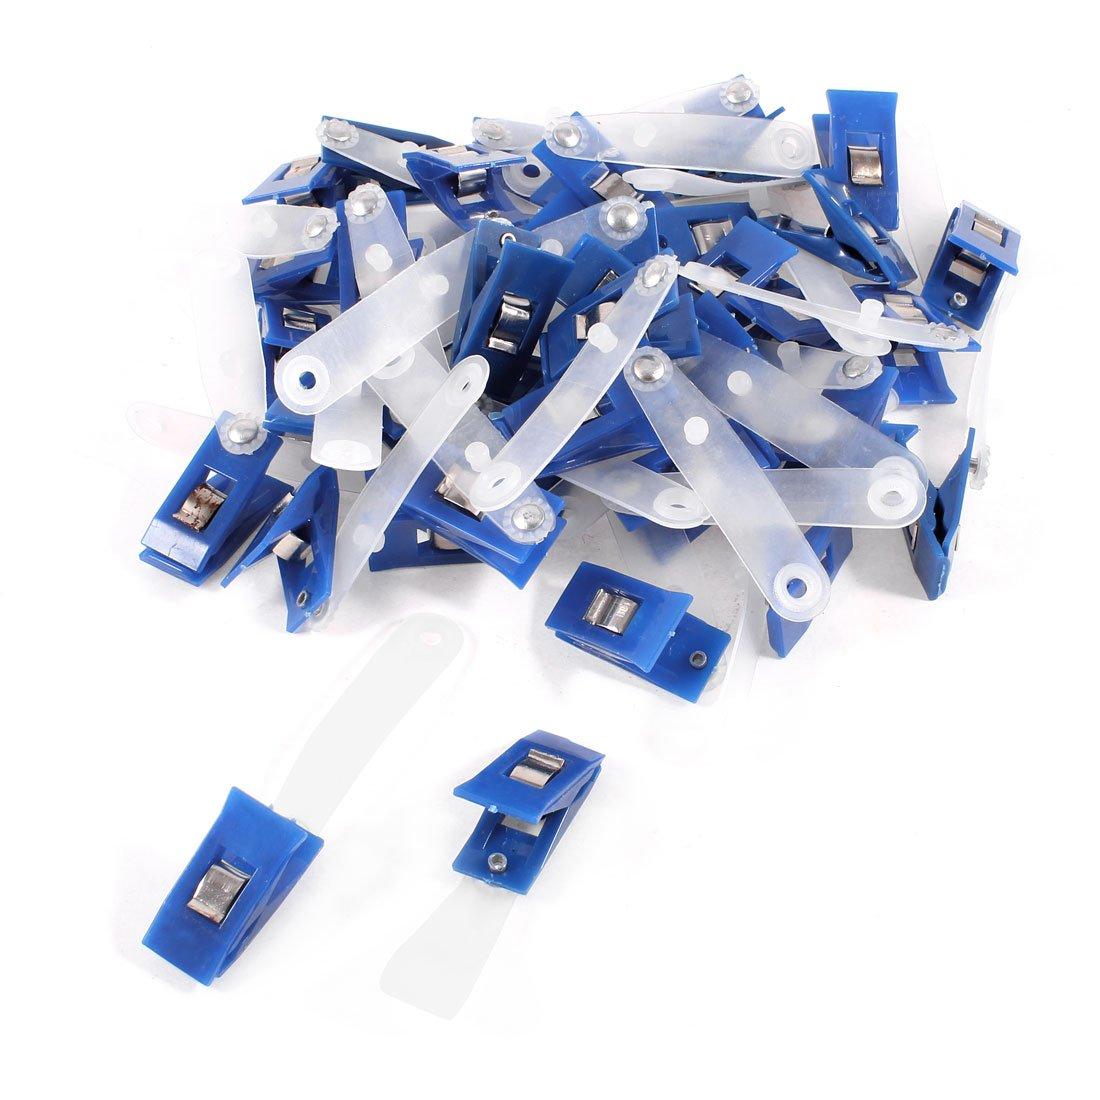 Affordable 40 Pcs Plastic ID Card Holder Name Badge Clips Fastener Blue